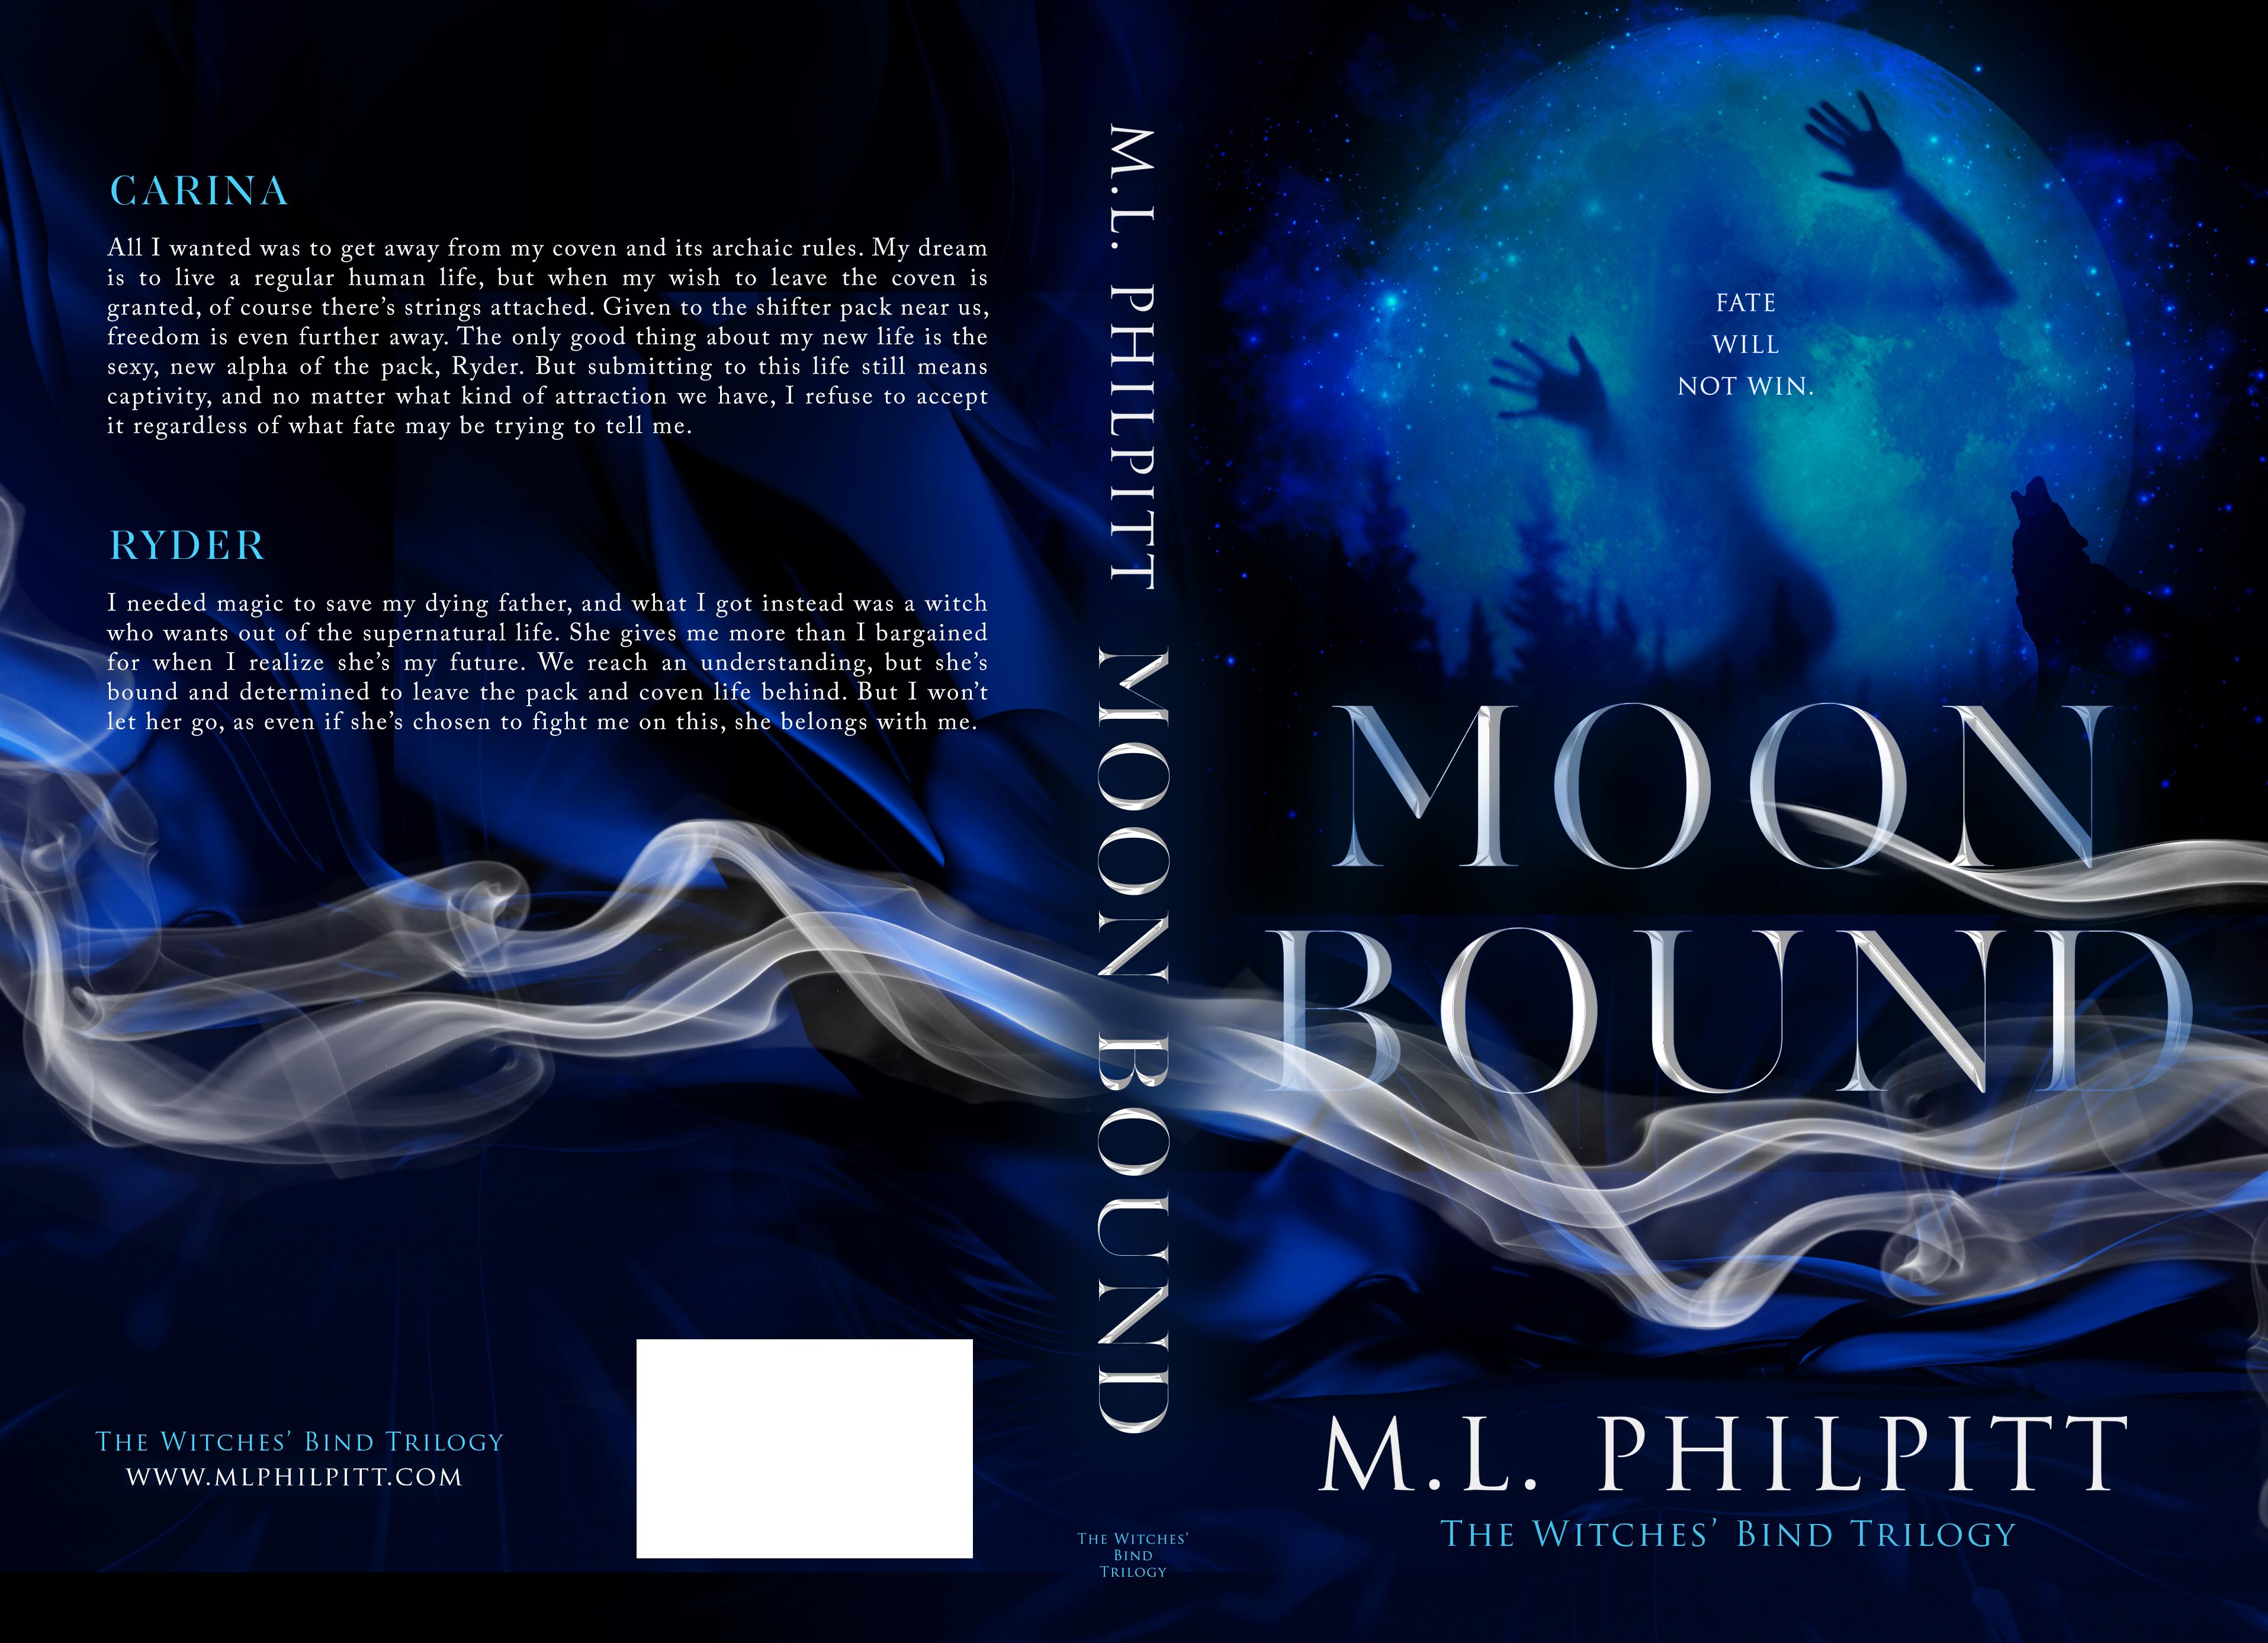 MoonBound_Full copy